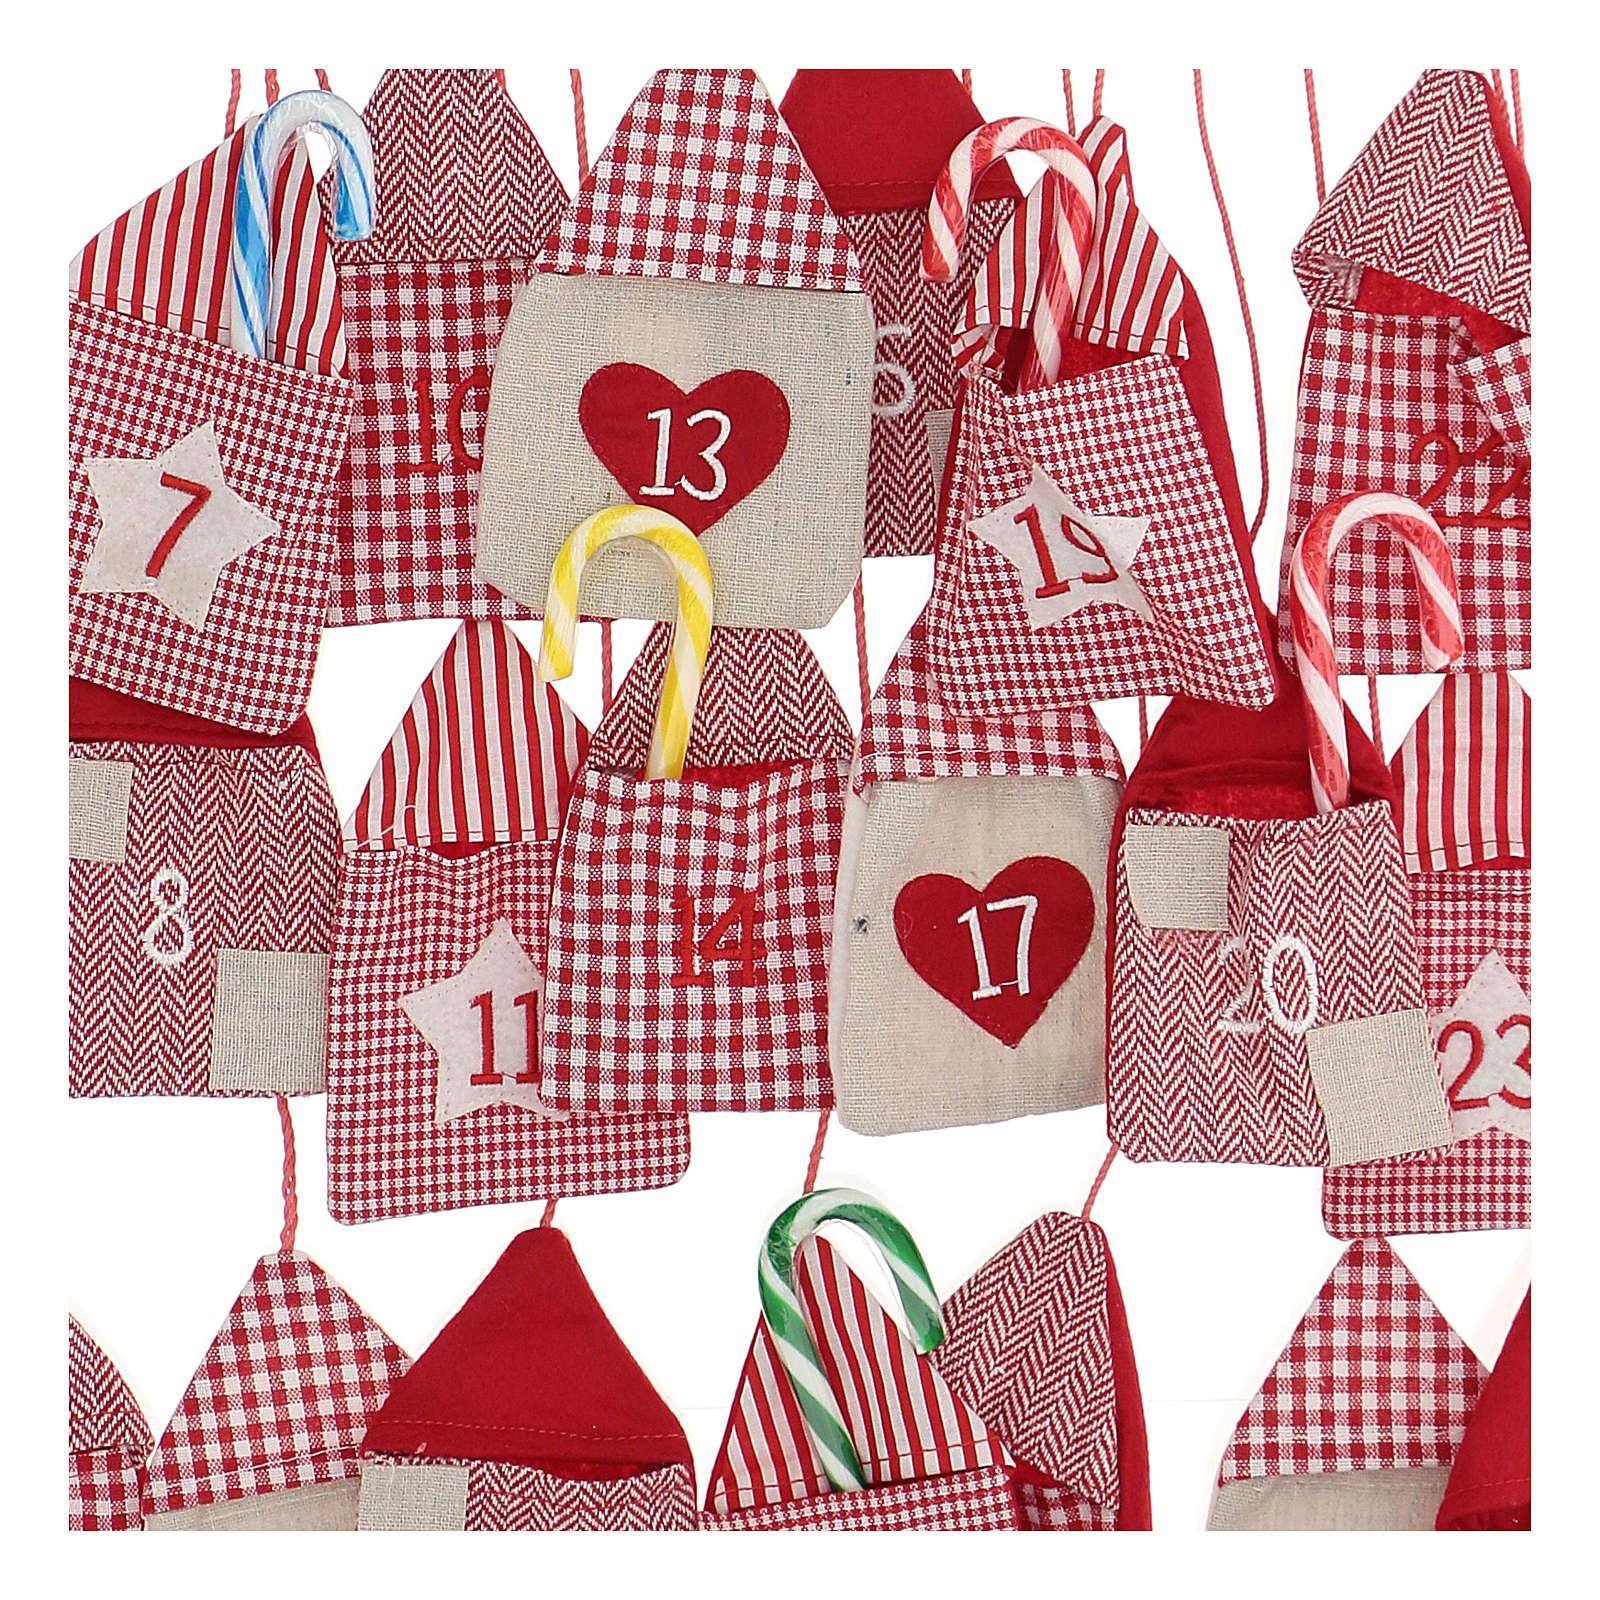 Calendario de Adviento con sacos 55x50 cm 3